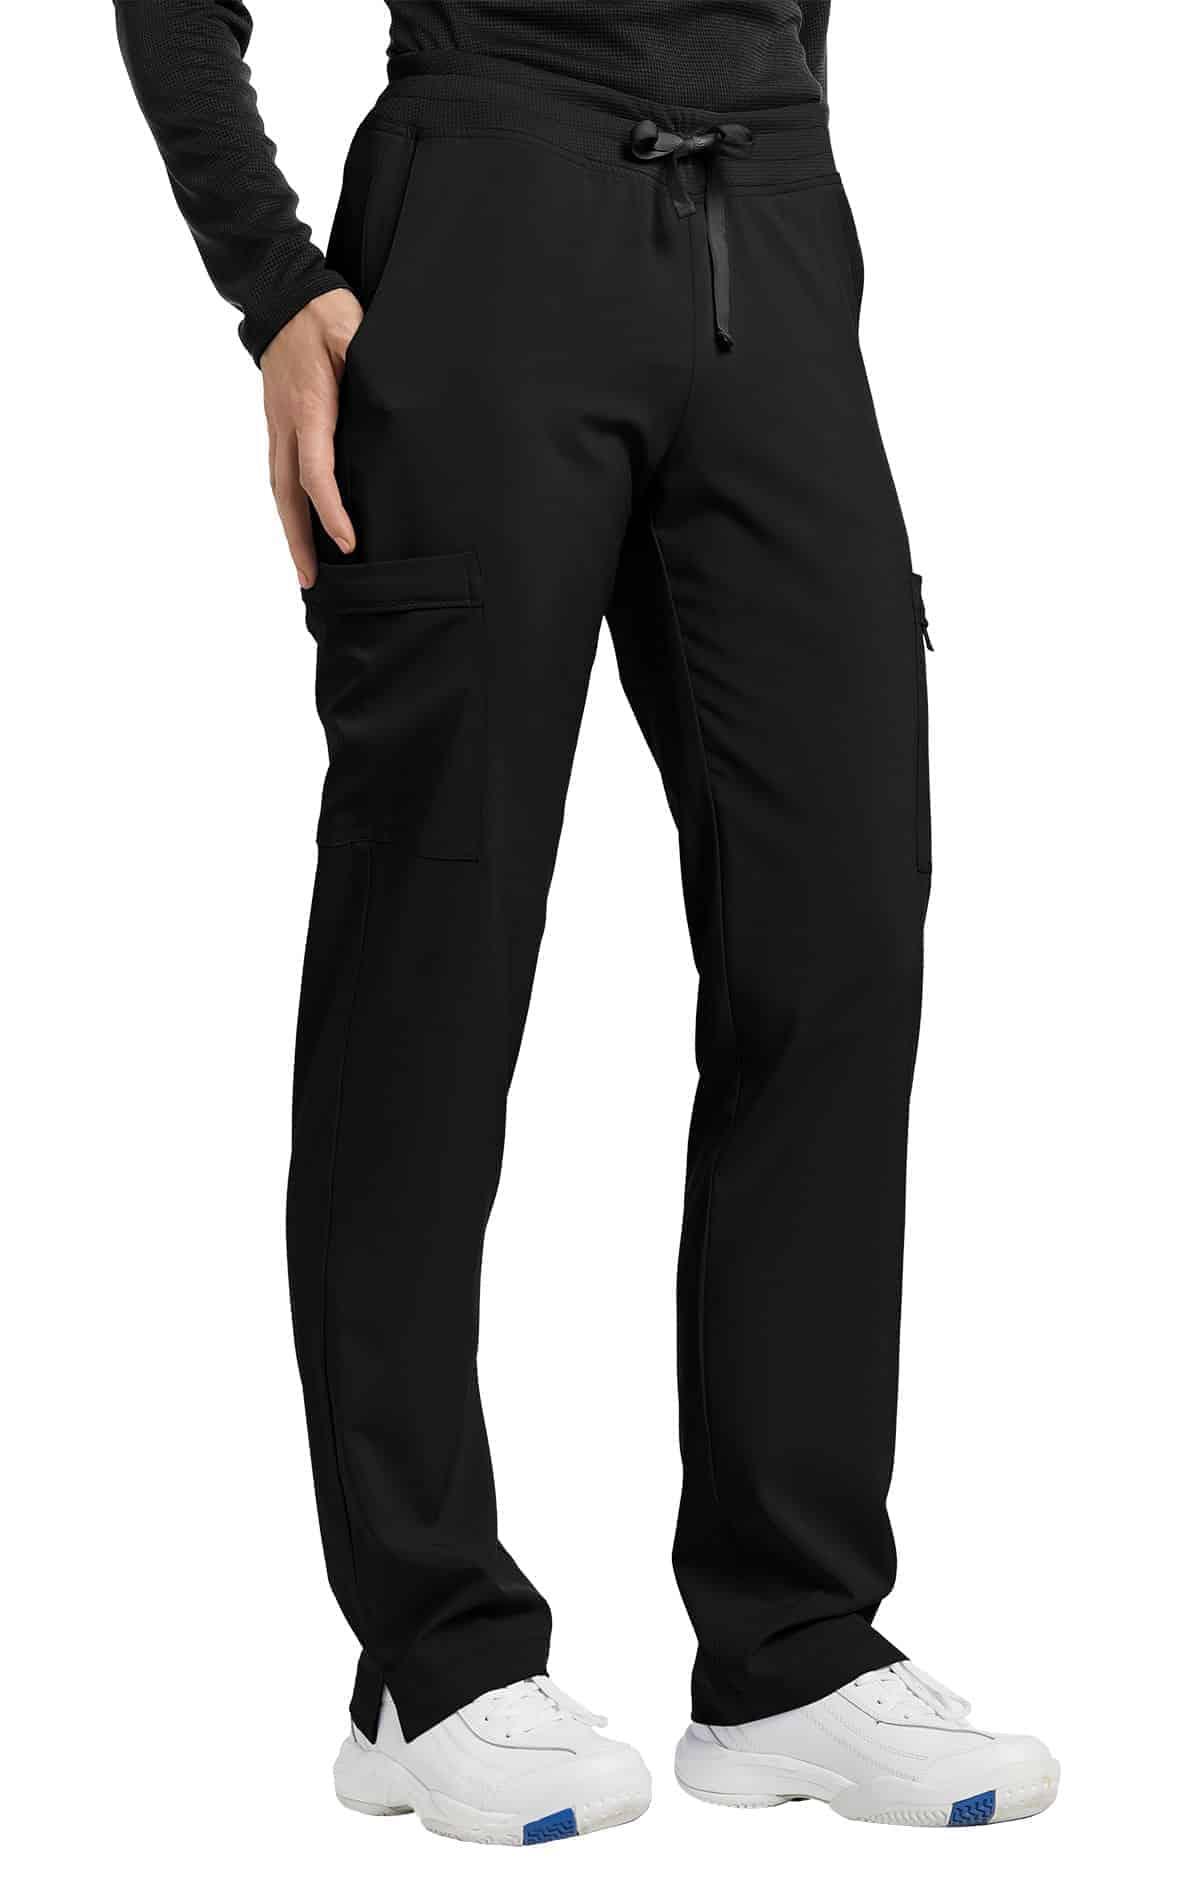 FIT Straight Leg Drawstring Pant